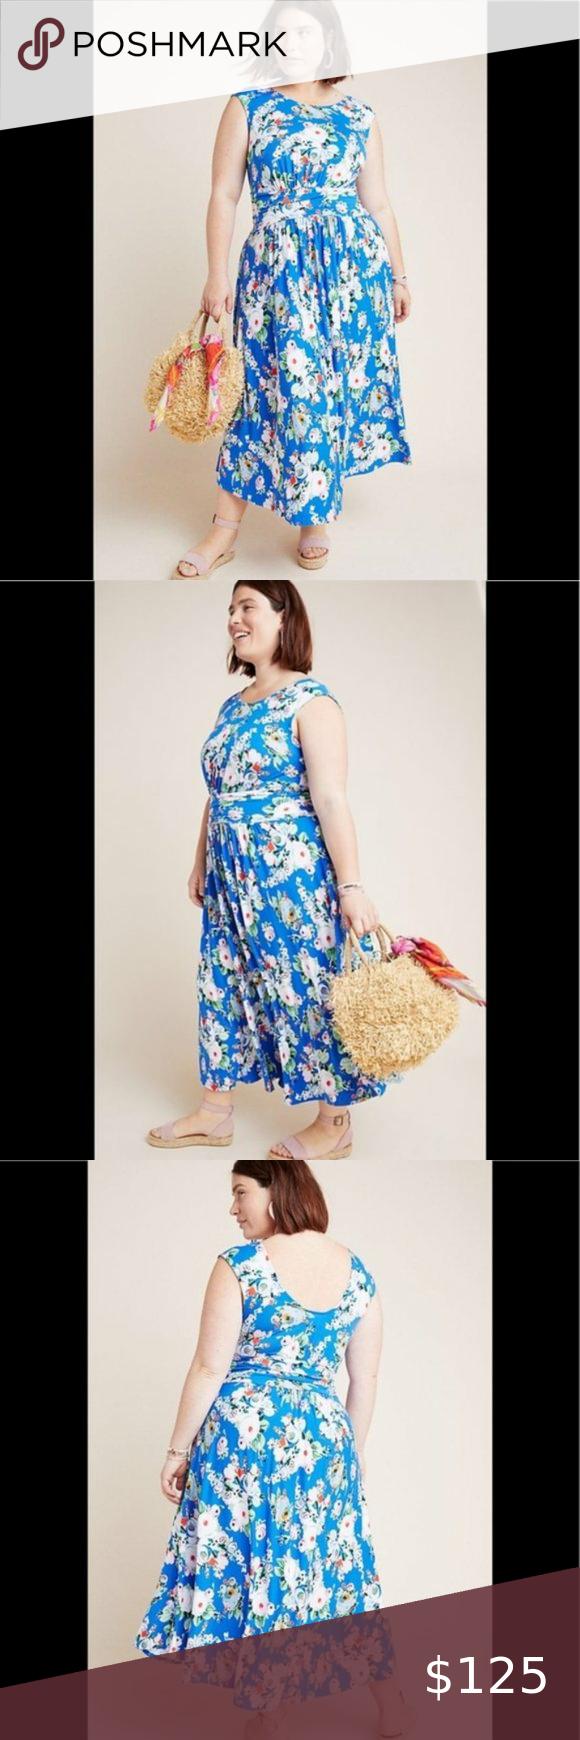 Nwt Anthro Maeve Kyla Floral Maxi Dress 3x Floral Maxi Dress Floral Print Dress Floral Maxi [ 1740 x 580 Pixel ]